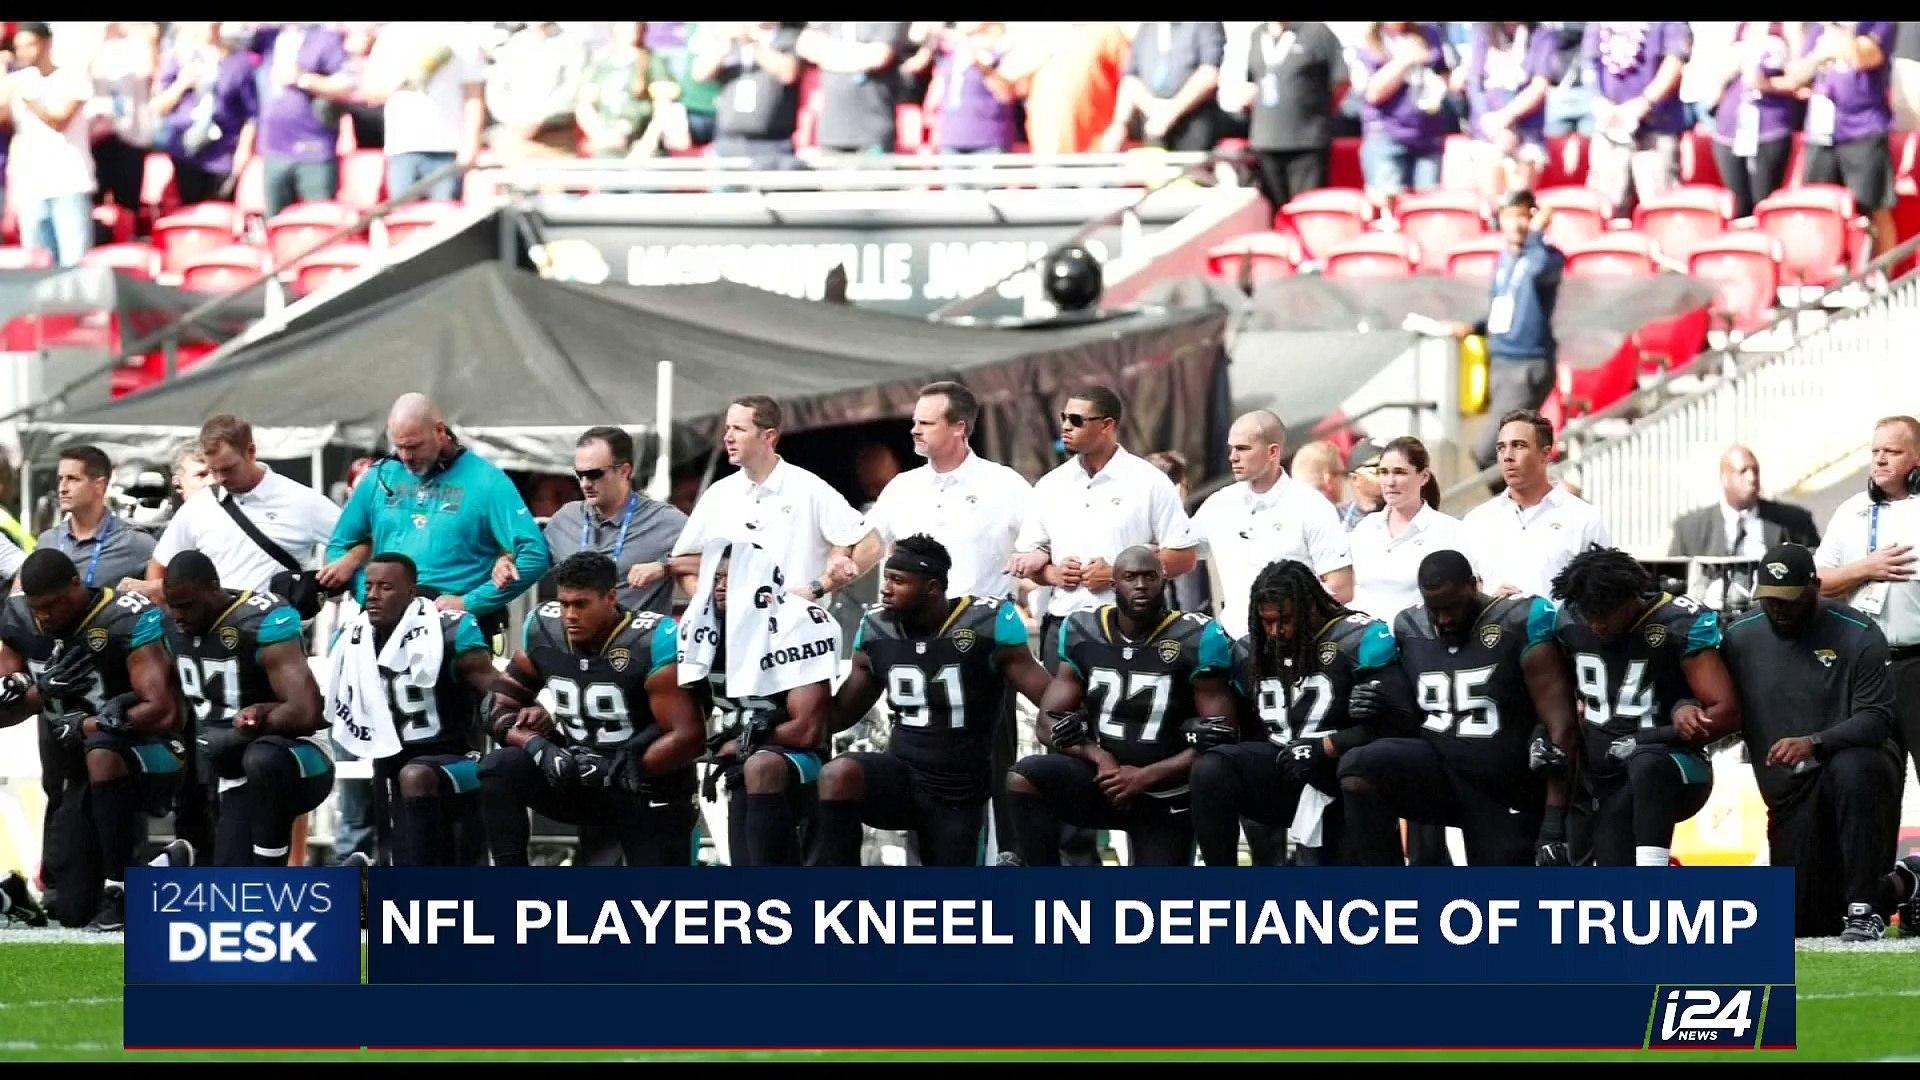 i24NEWS DESK | NFL players kneel in defiance of Trump | Sunday, September 24th 2017